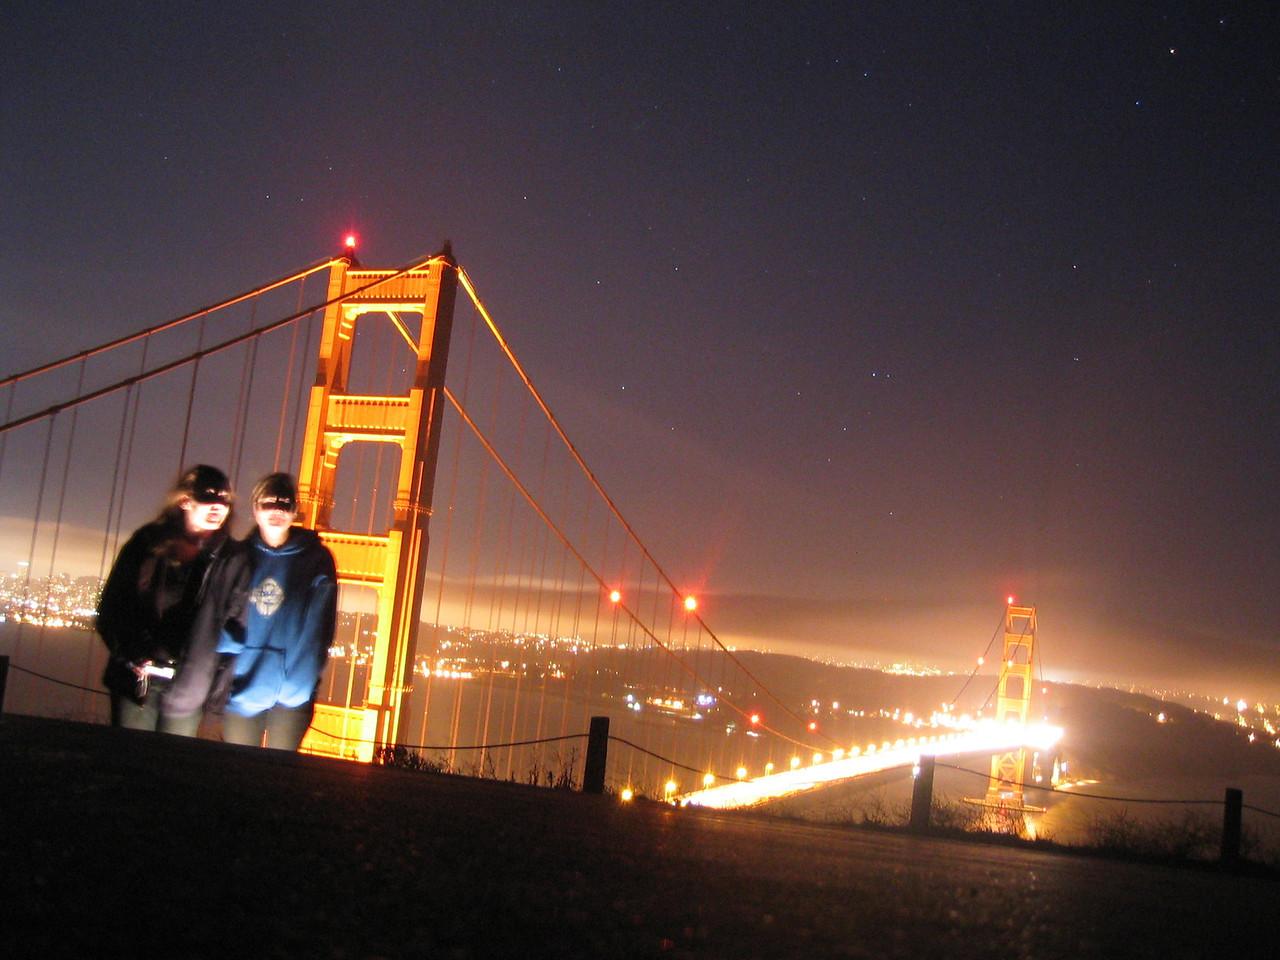 2004 07 12 Monday - Carrie & Melody horror story @ Golden Gate Bridge